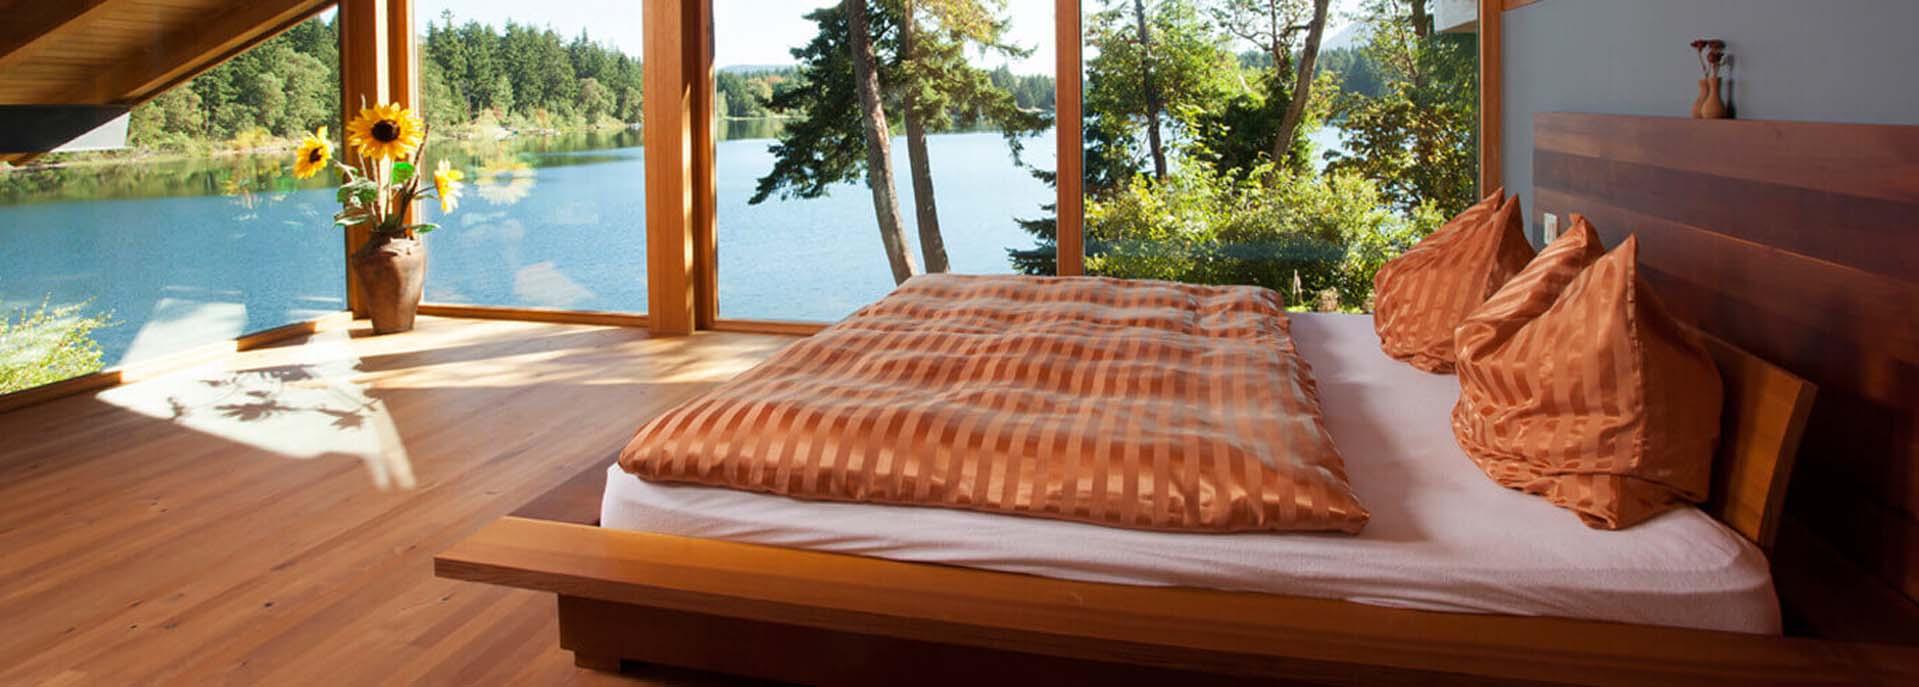 Douglas Fir planks for Decks & Bed